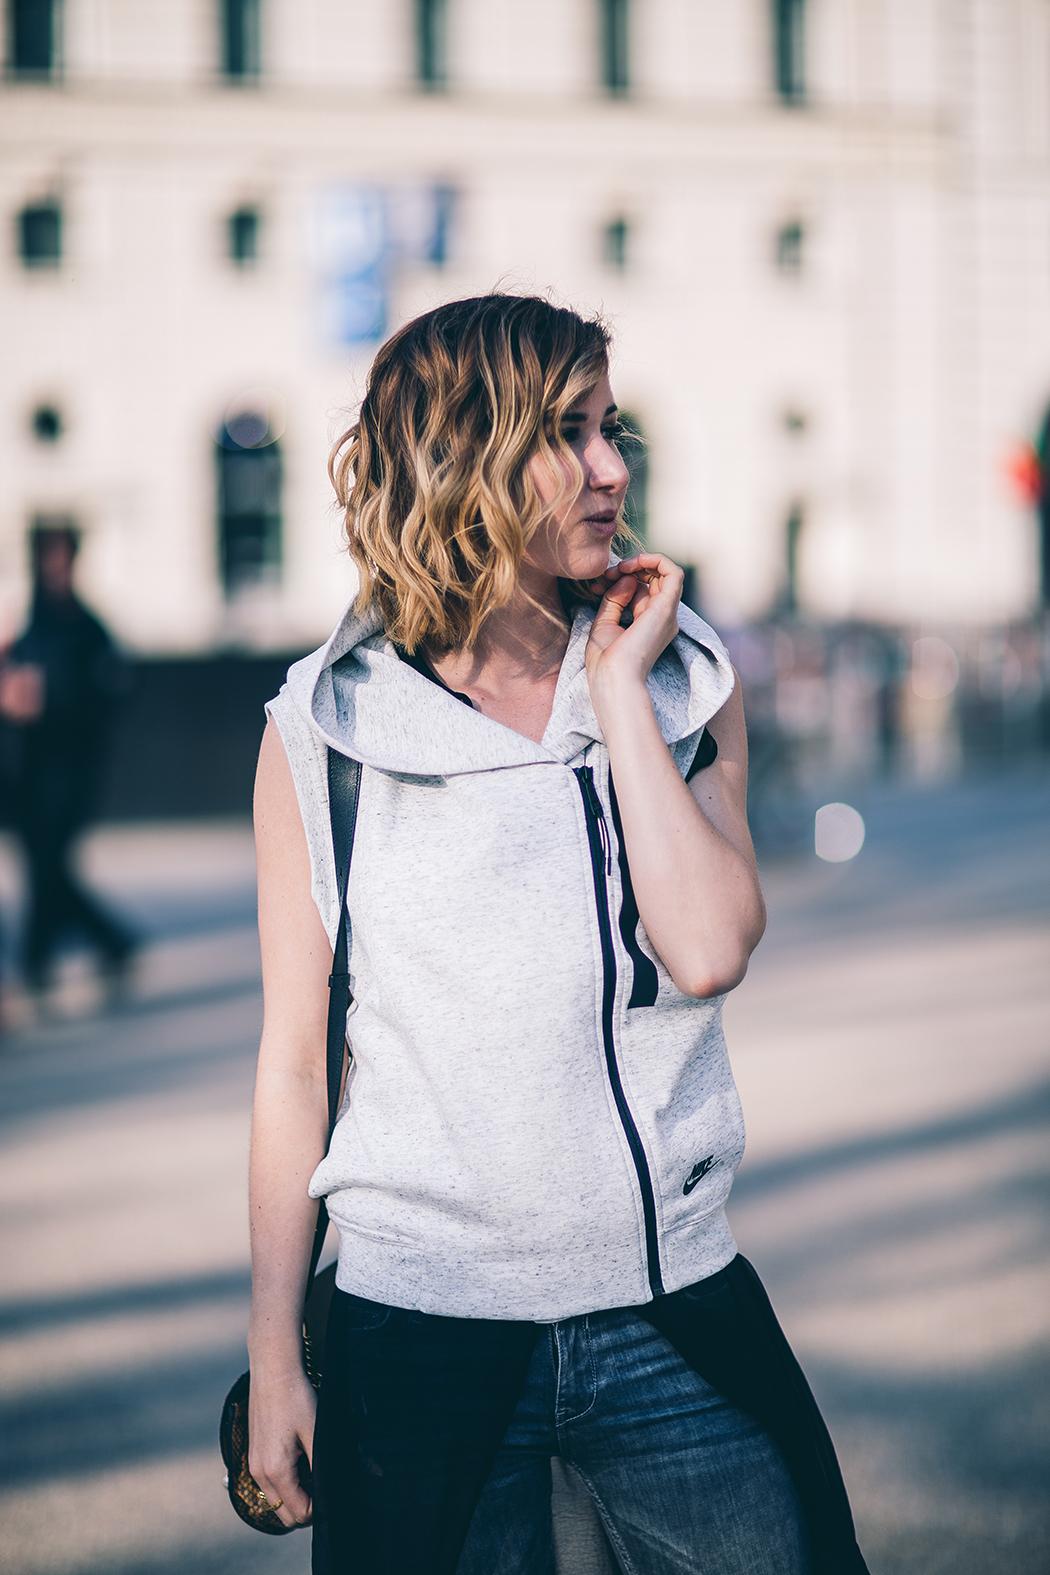 Fashionblog-Fashionblogger-Fashion-Blog-Blogger-Muenchen-Berlin-Kerastase-Nutrive-Test-Empfehlung-Beautyblogl-Lindarella-Erfahrung-Salon_Pauli20160404_0008